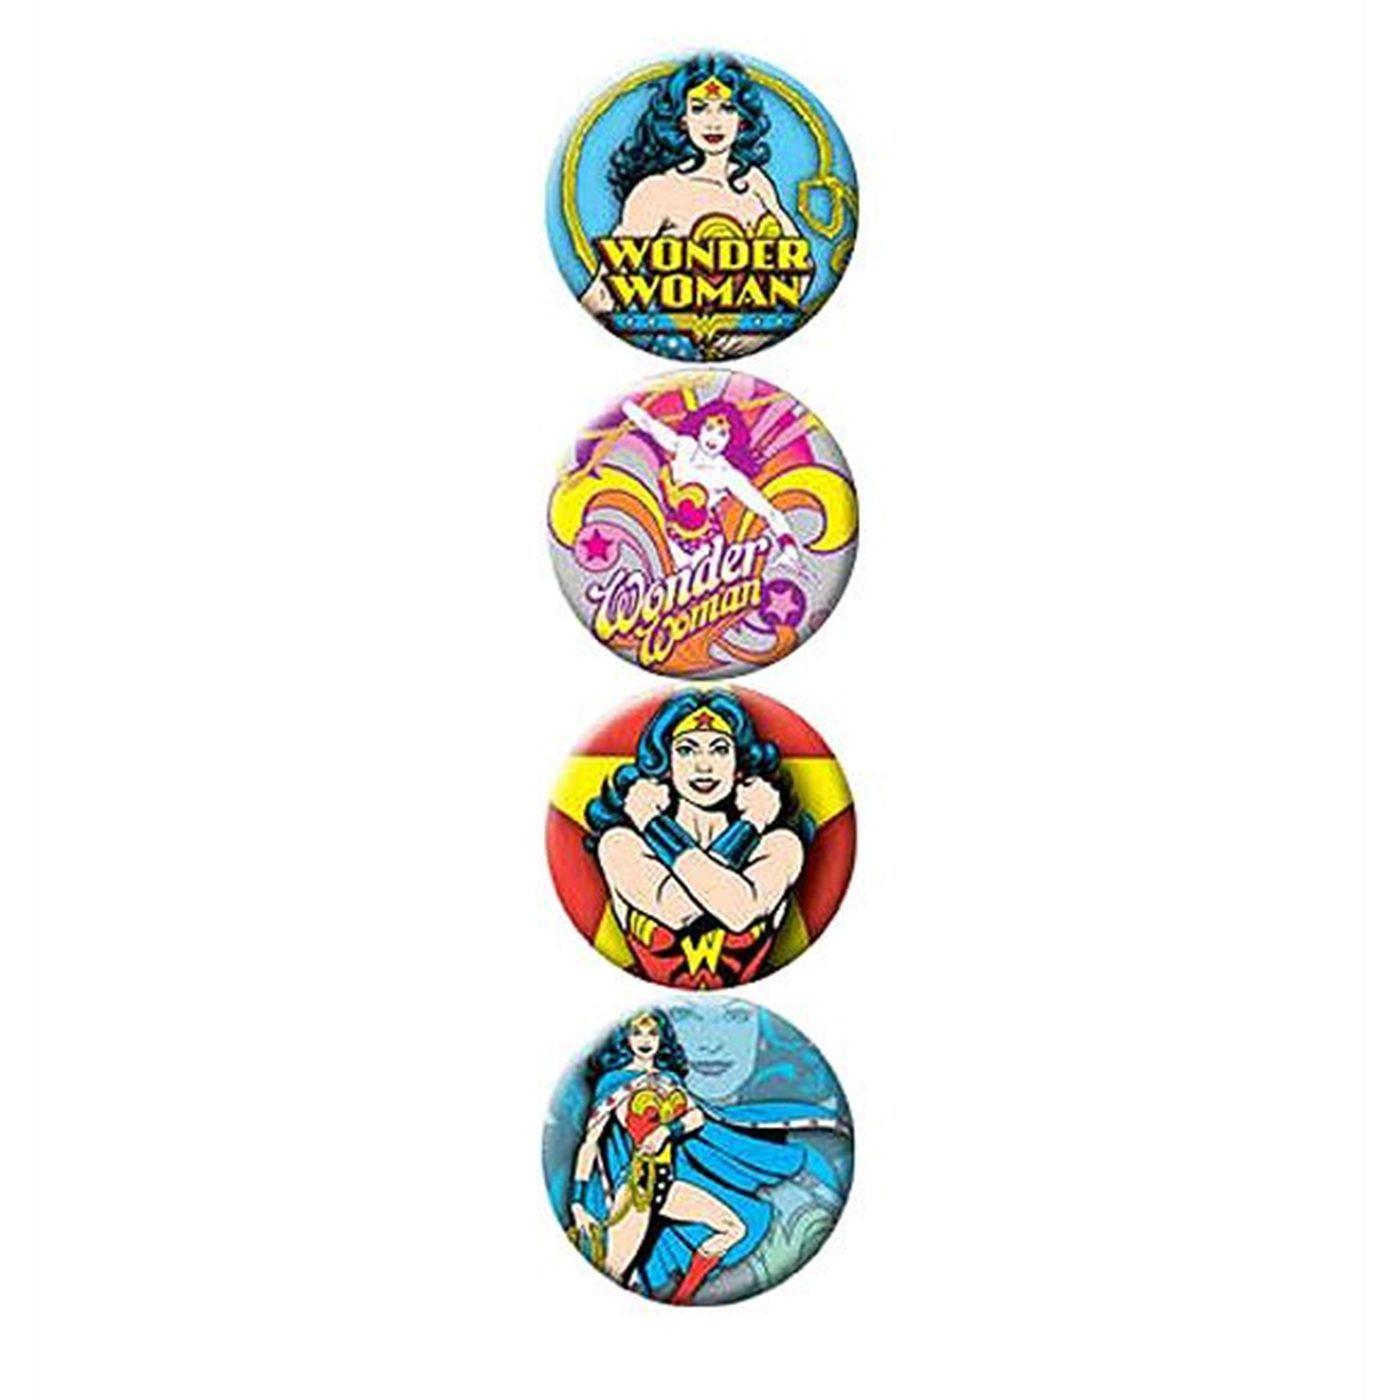 Wonder Woman Flair Button Set of 4